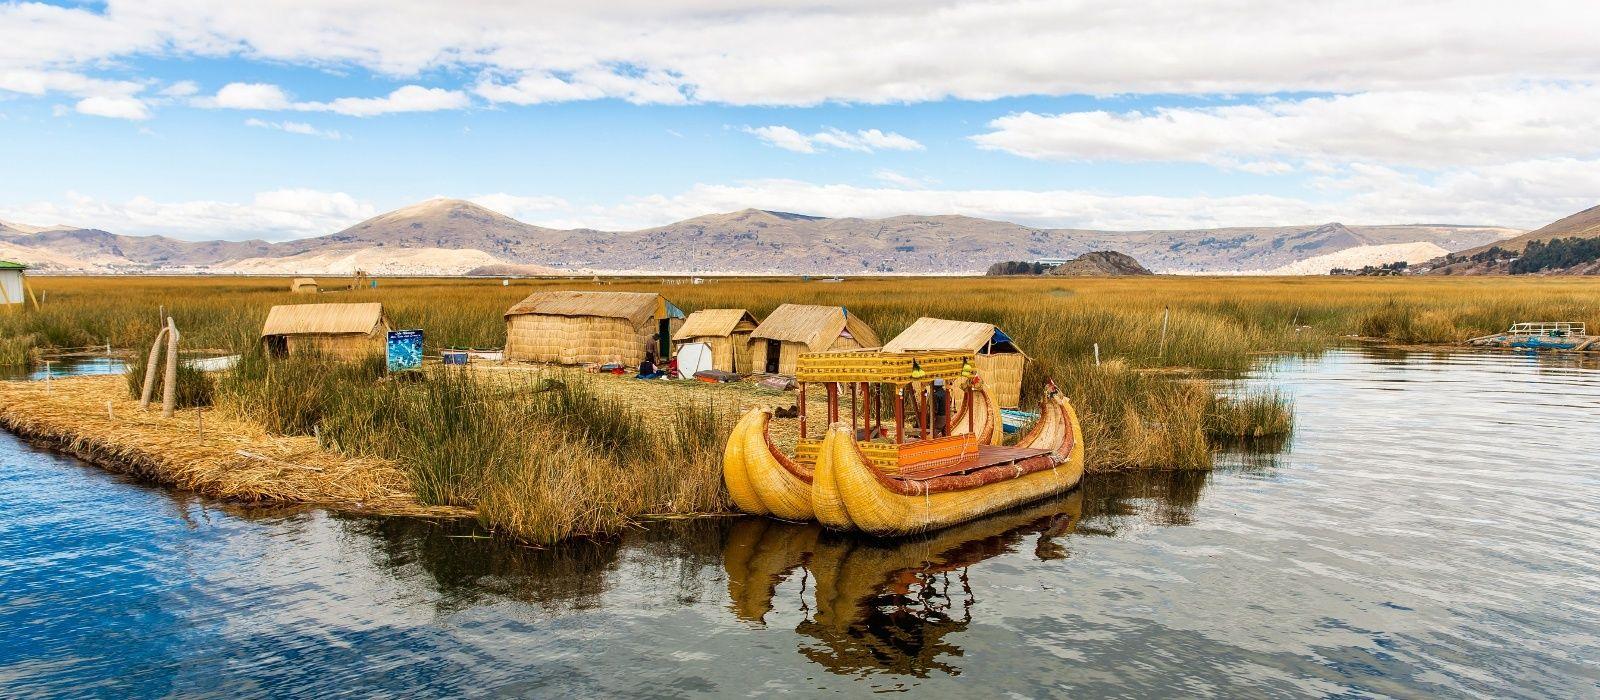 Destination Puno Peru